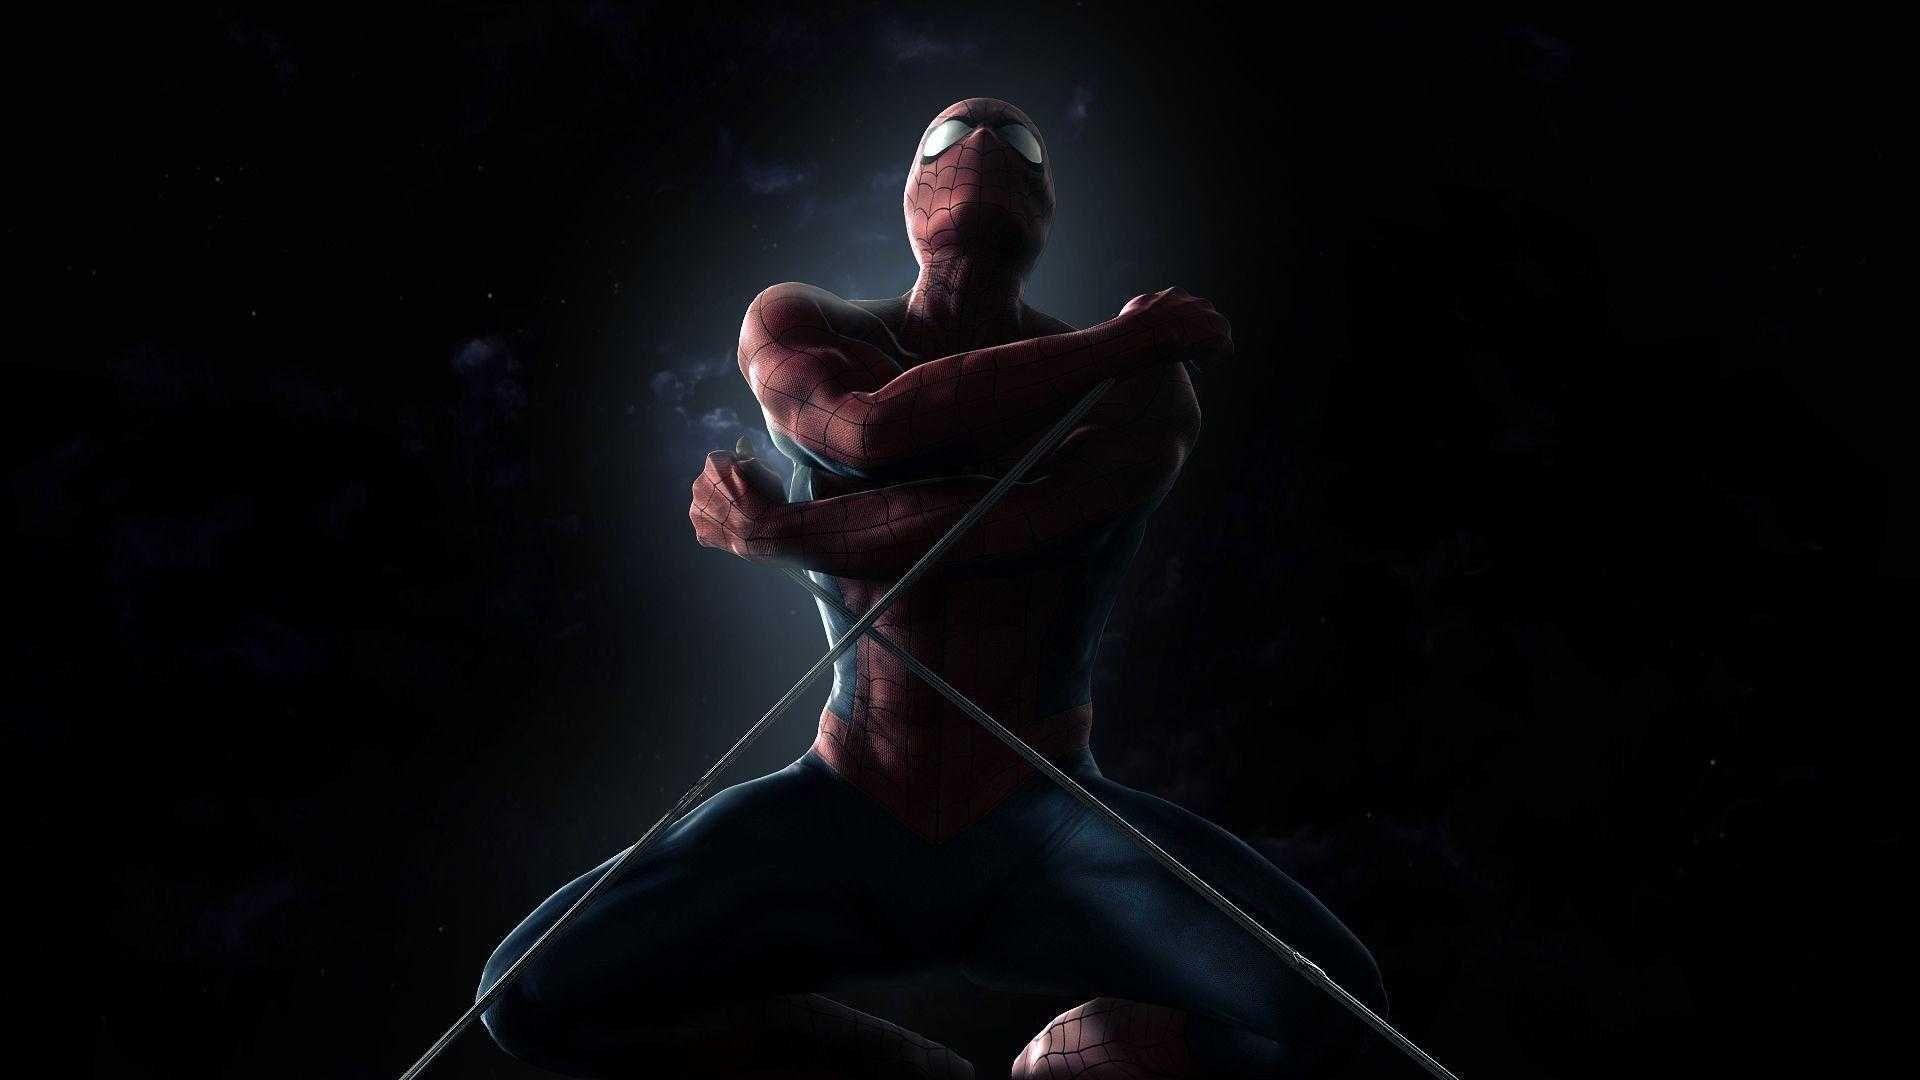 Top Free 4K Marvel Backgrounds